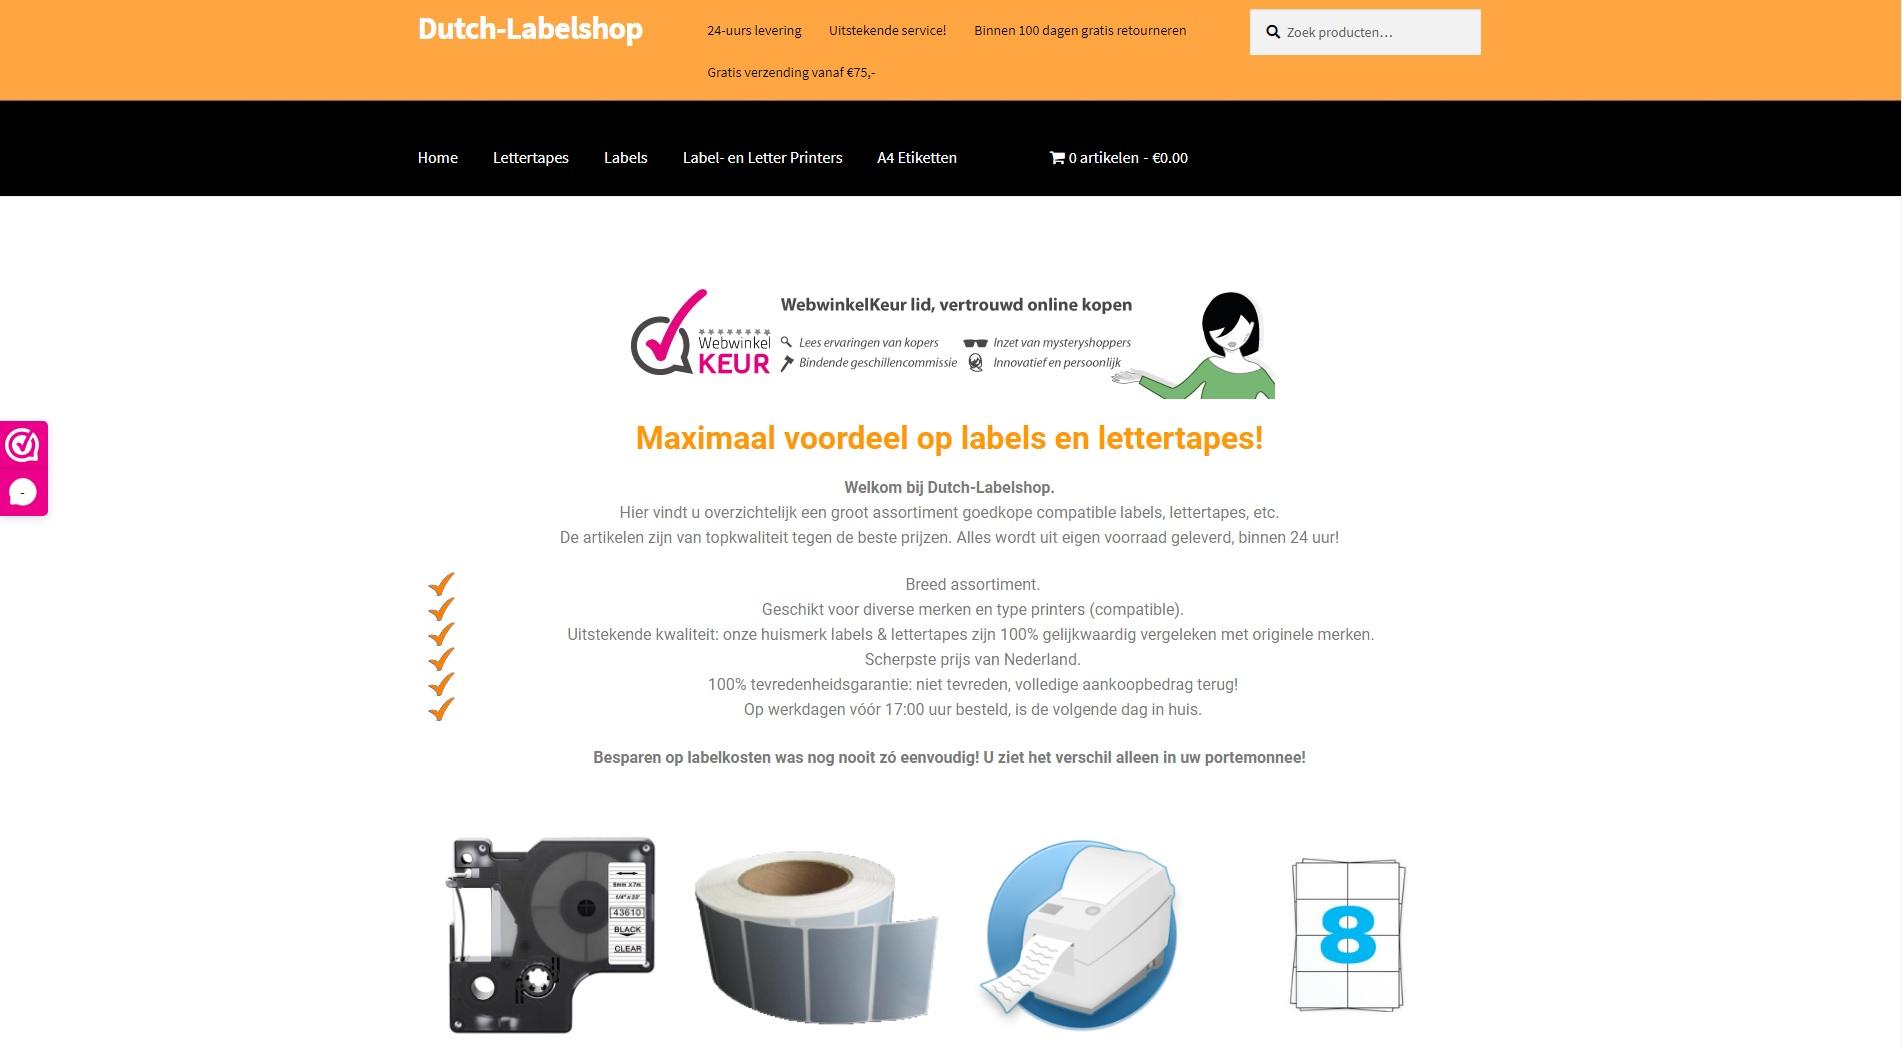 overijssel 038webdesign webdesign webdesignzwolle zwolle webdesign webhosting hosting website zwolle websitezwolle webshop webshopzwolle webshops onlinewinkel onlinewinkelzwolle onlinewinkels ecommerce woocommerce wordpress